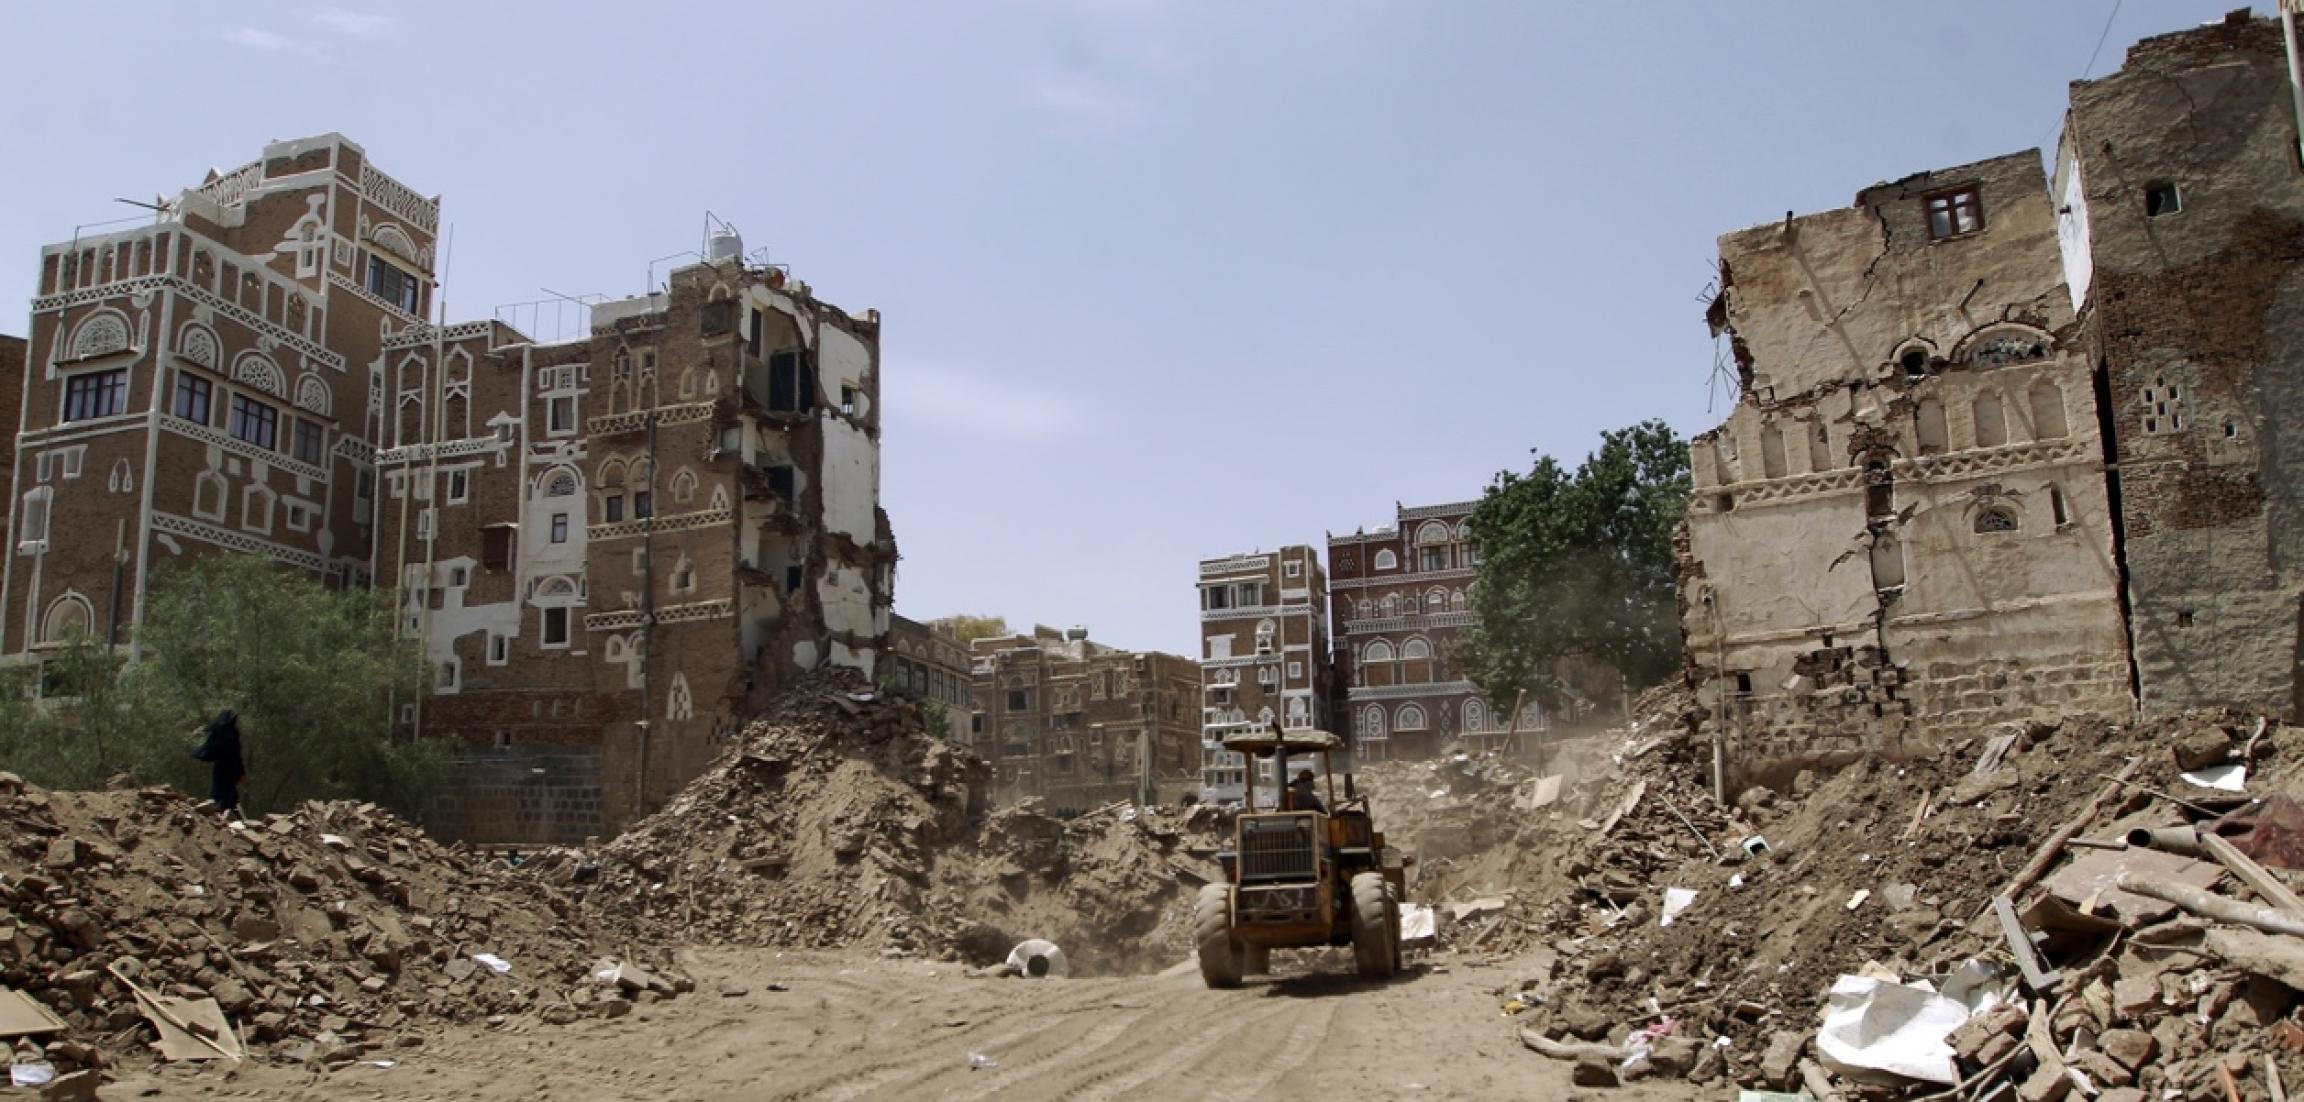 Macerie di alcune case a Sana'a dopo un raid saudita. Foto: Getty Images